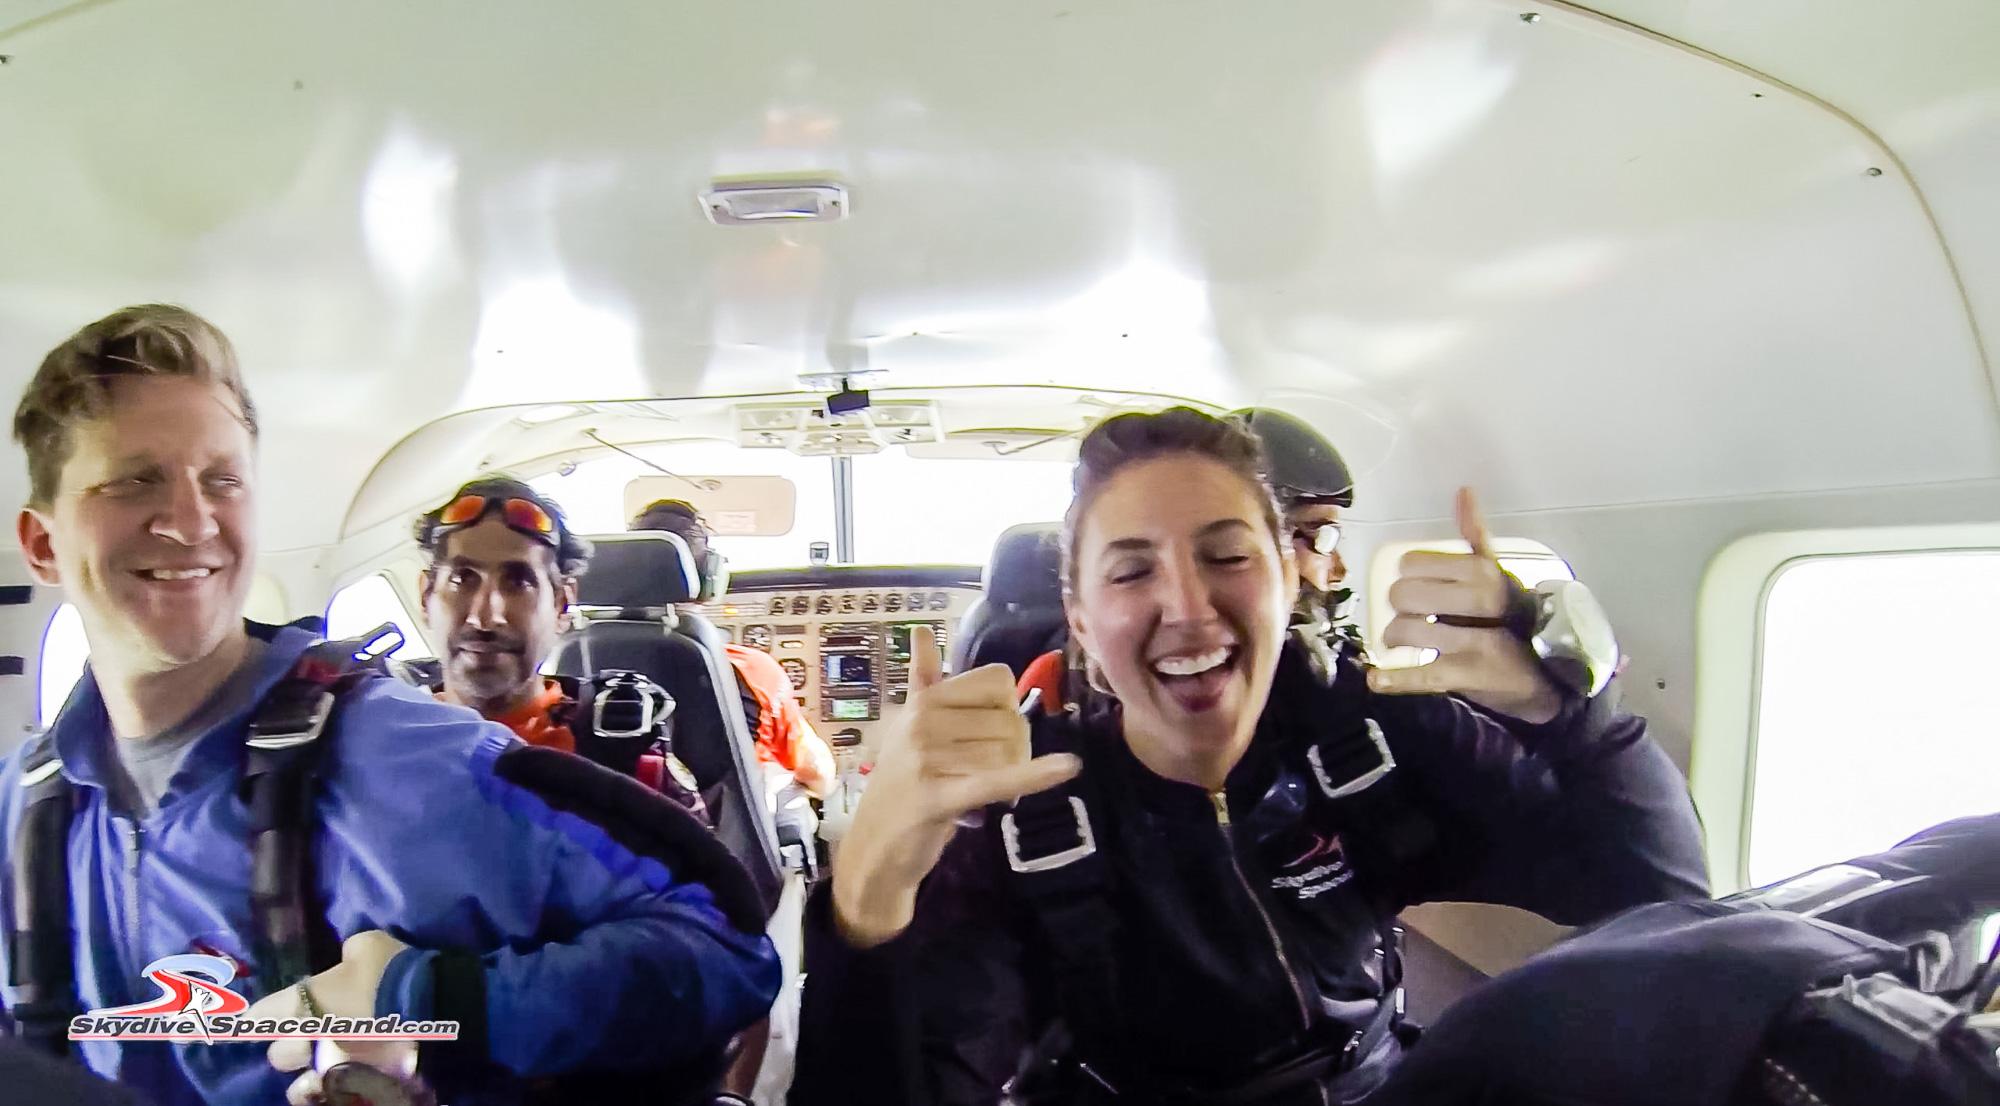 Skydiving Day-Video Screenshots-0004.jpg